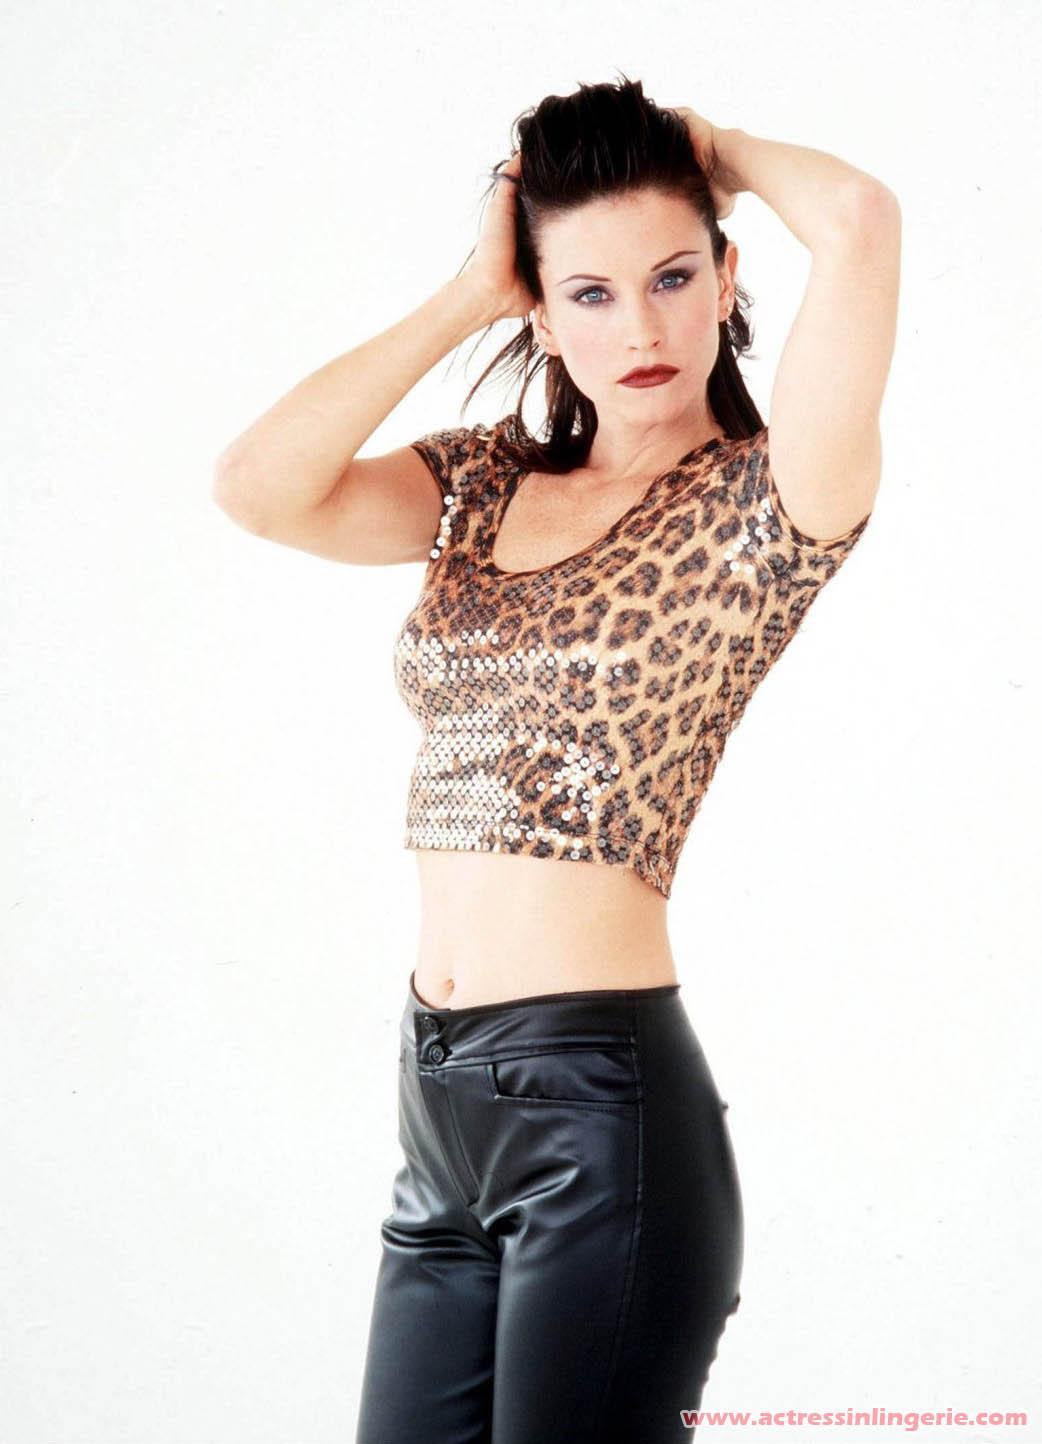 http://4.bp.blogspot.com/_JFX5_9i0Xng/TDG3aulK7kI/AAAAAAAAEXc/cc3leOic33Q/s1600/Courteney-Cox-Hot-Underwear+3.jpg